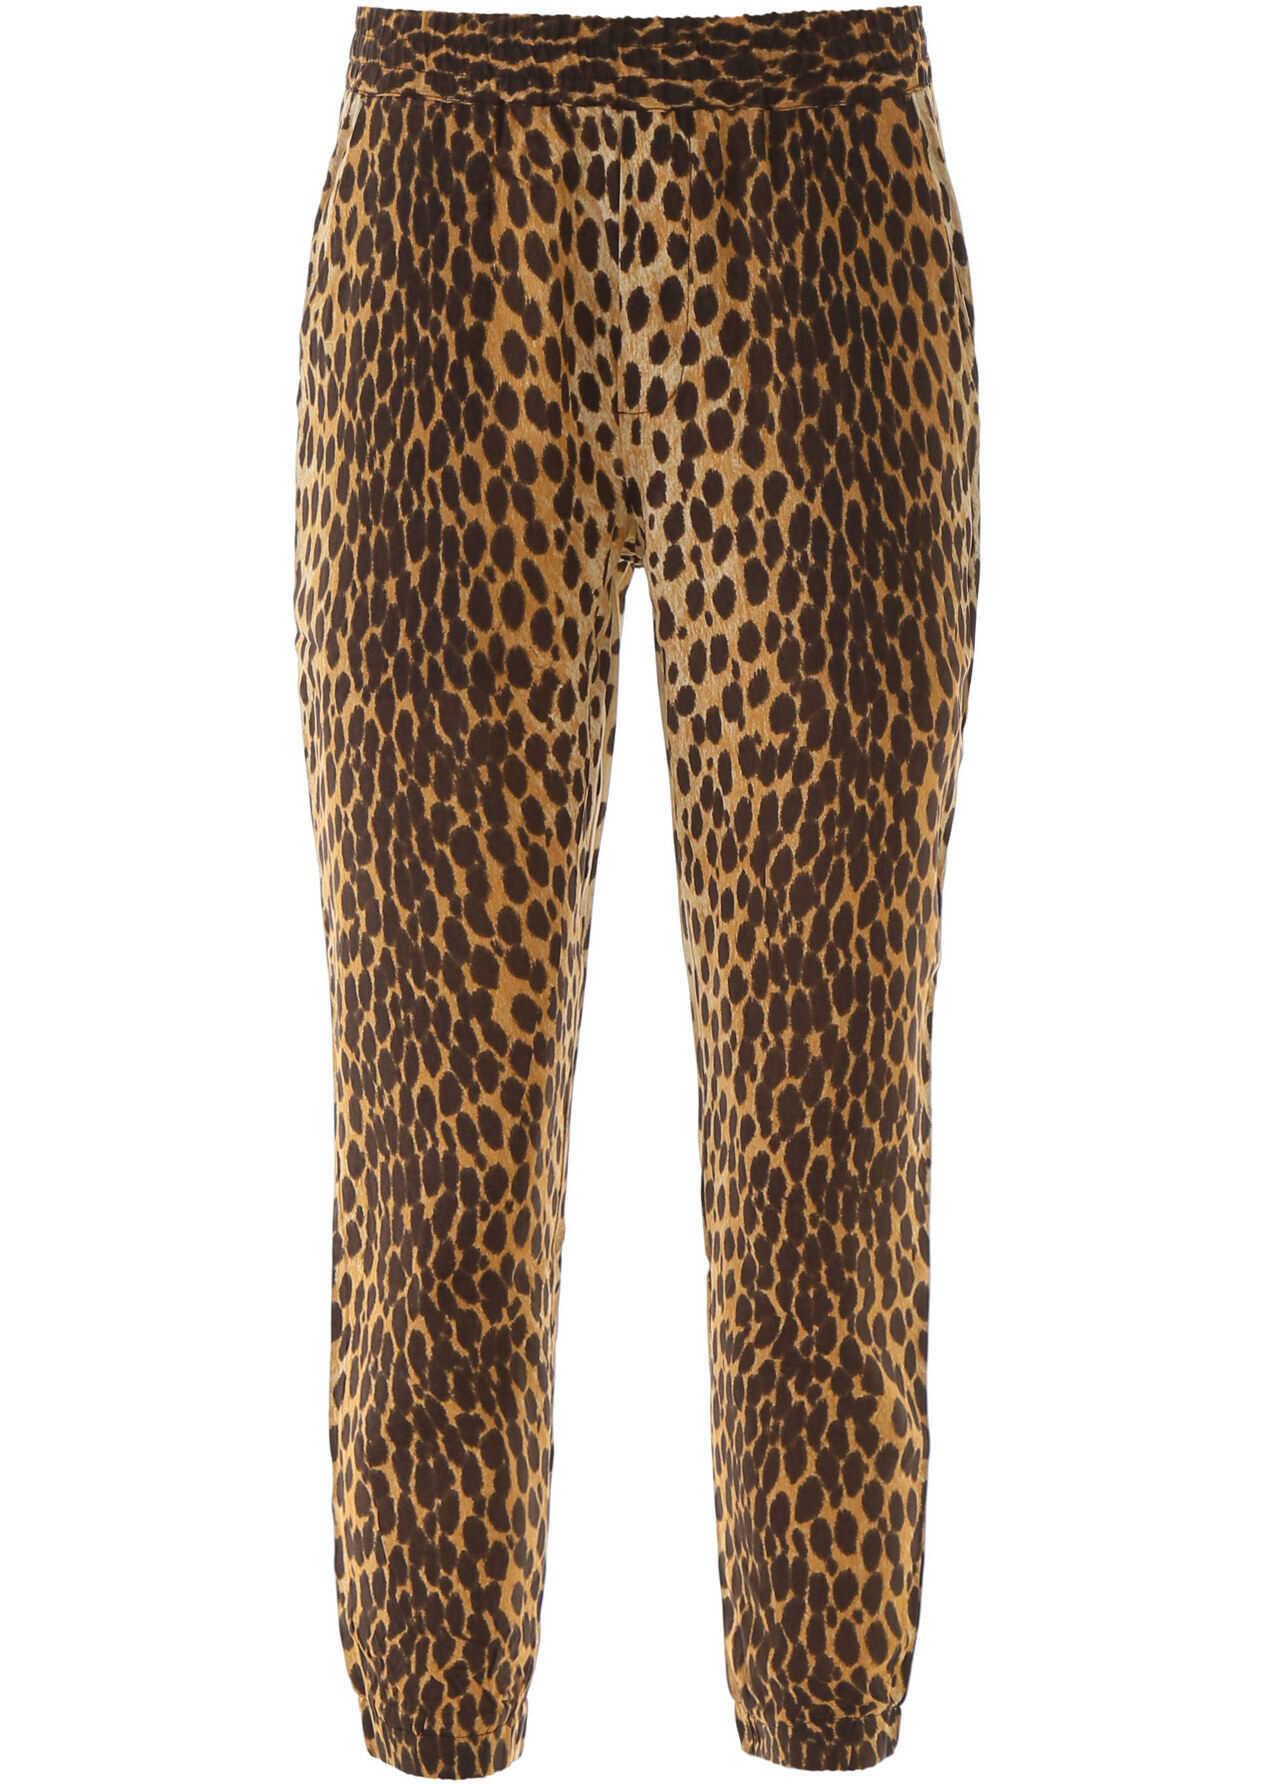 R13 Animalier Trousers CHEETAH